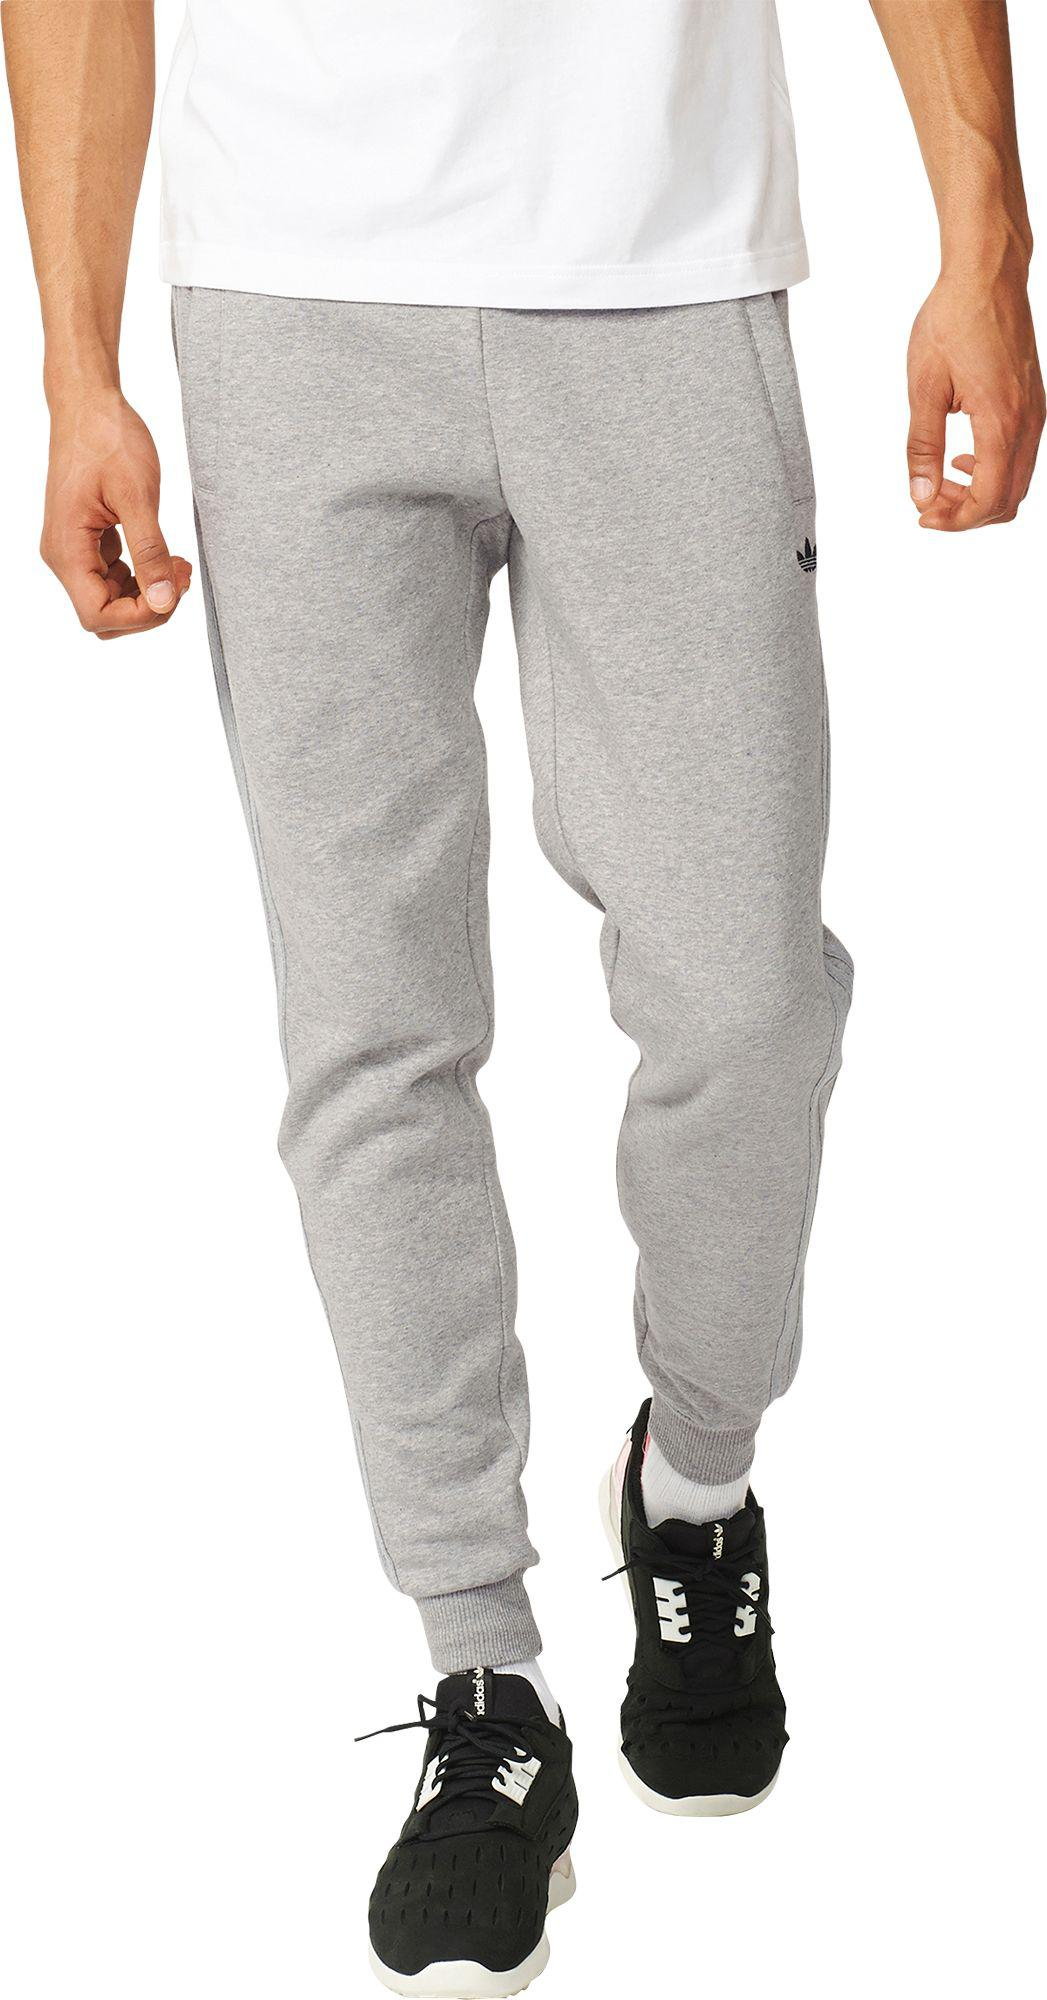 Lyst - adidas Originals Classic Trefoil Cuffed Sweatpants in Gray ... e0aae51656